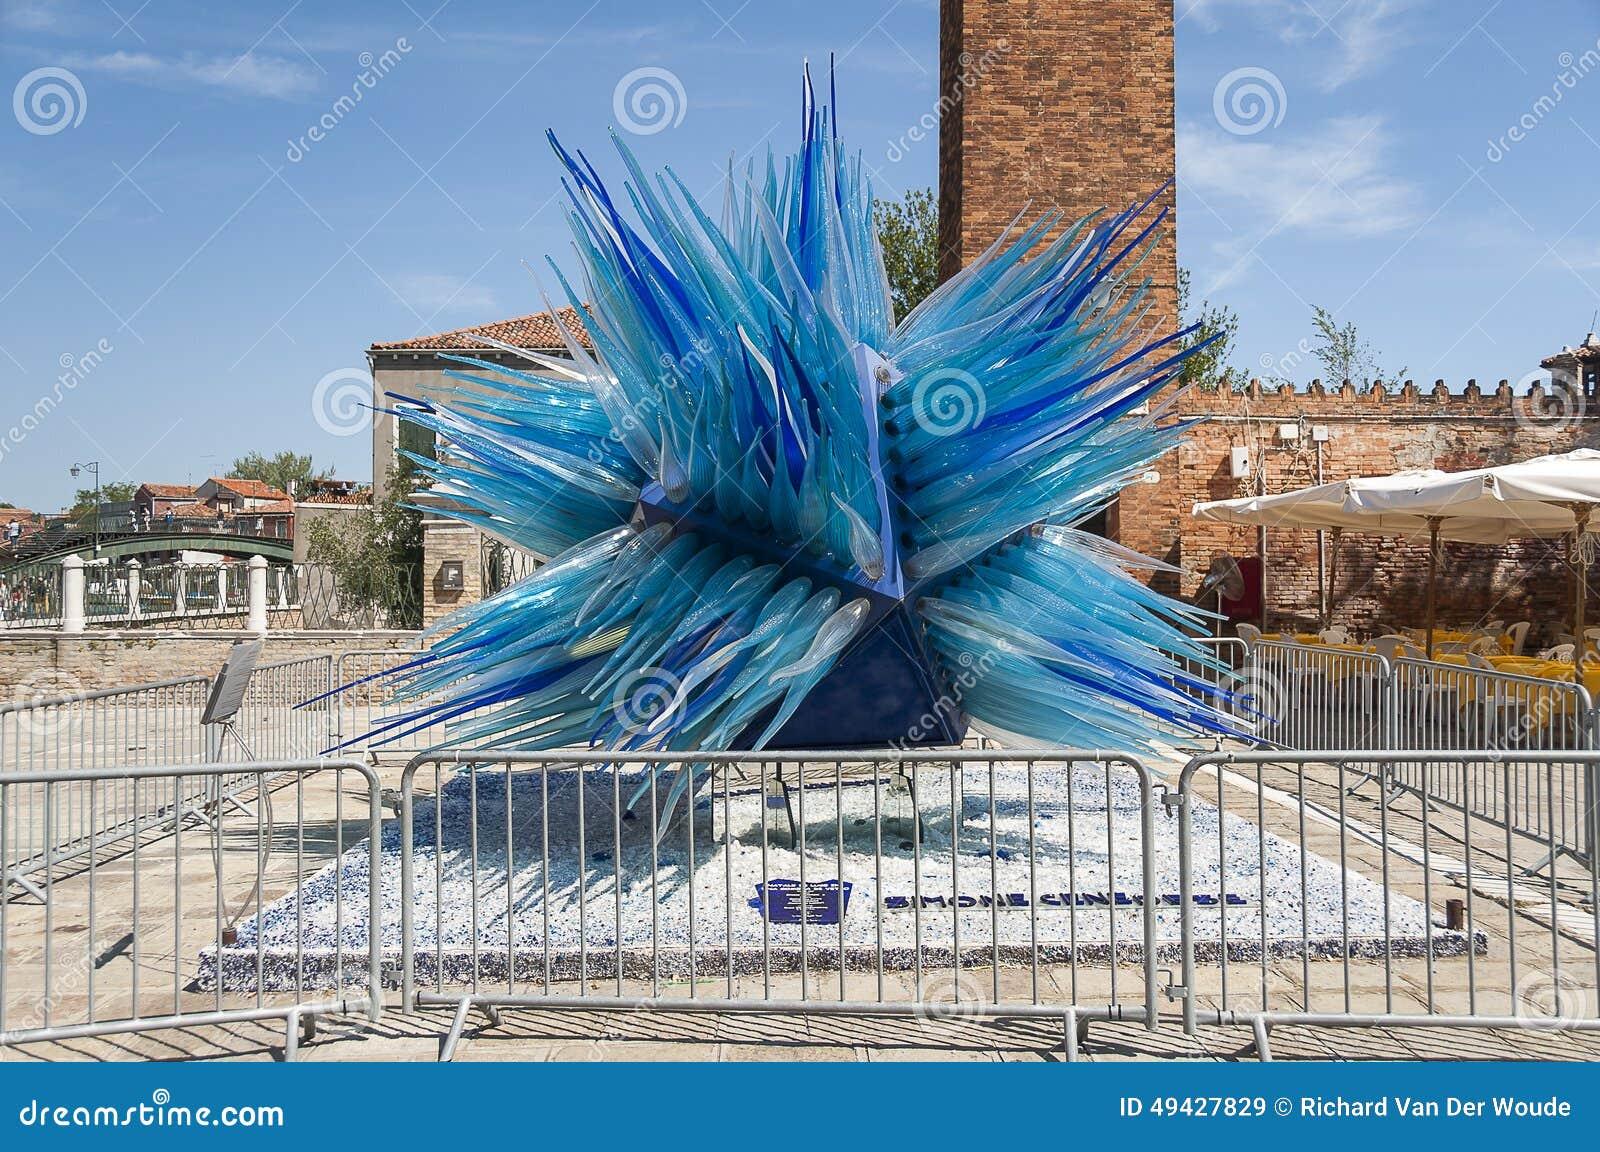 sculpture en verre bleue dans murano venise italie image stock ditorial image 49427829. Black Bedroom Furniture Sets. Home Design Ideas